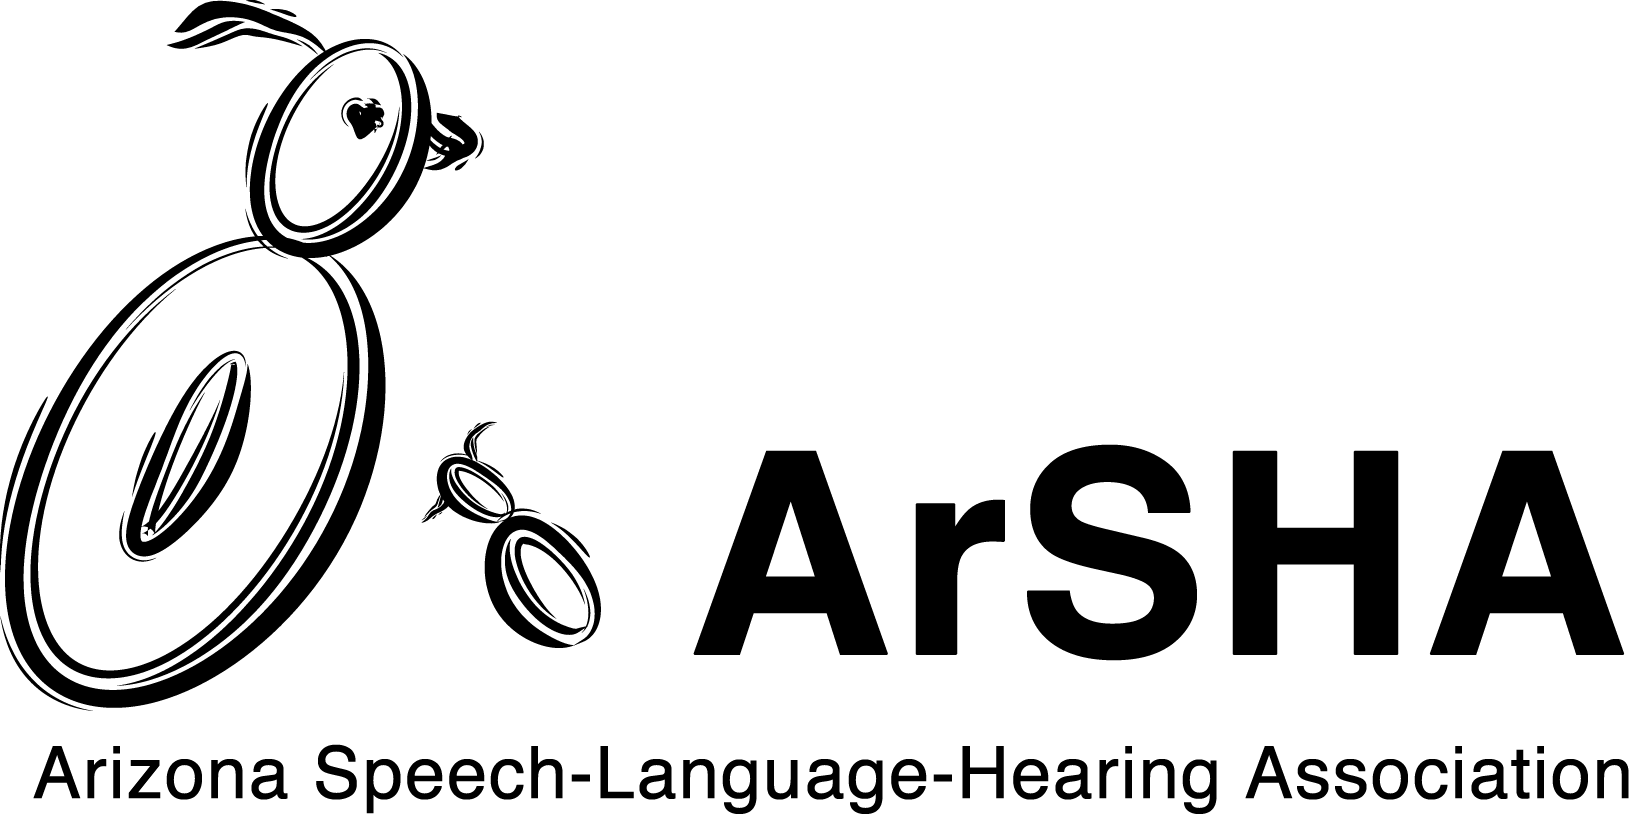 ArSHA Logo – ArSHA | The Arizona Speech-Language-Hearing